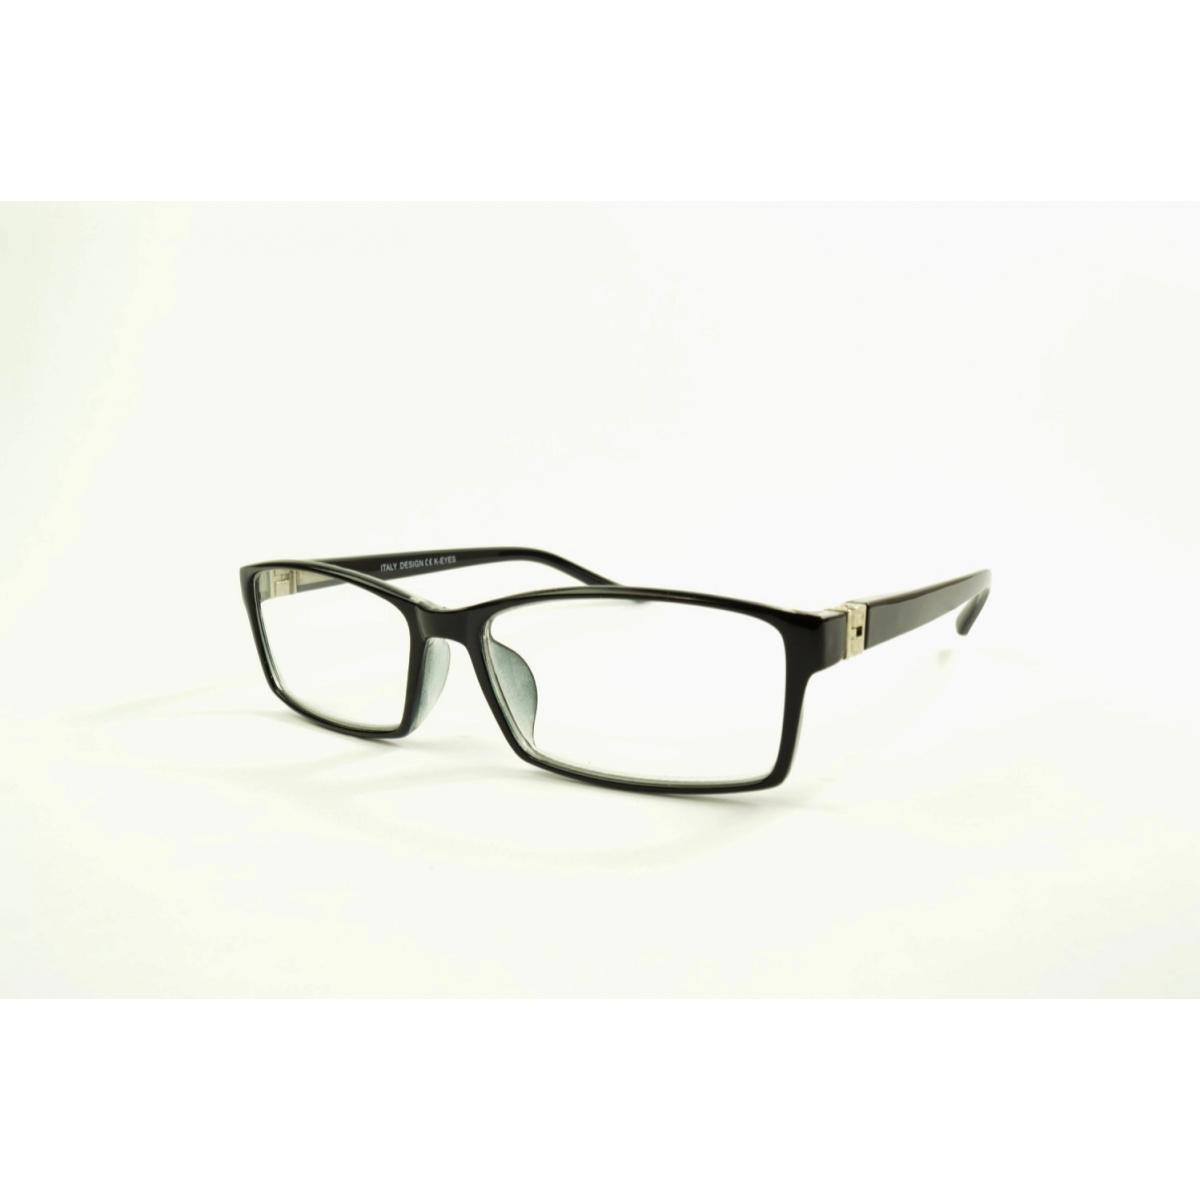 Grandes gafas de lectura rectangulares con patillas extensibles 180 grados